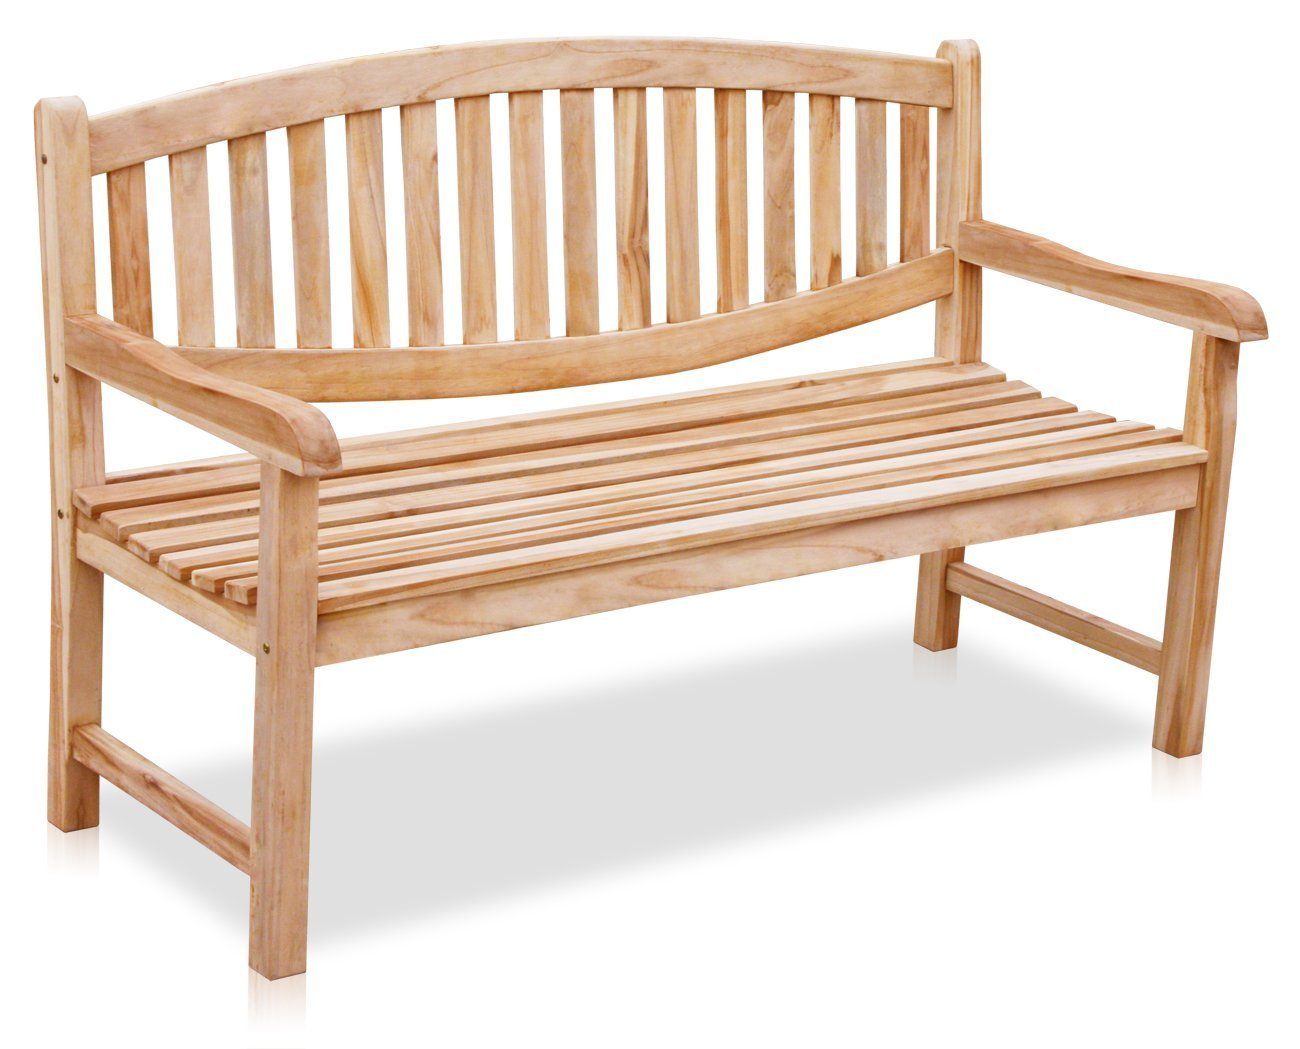 KMH®, Teak 3-sitzer Gartenbank Newcastle 150 cm (#102145)